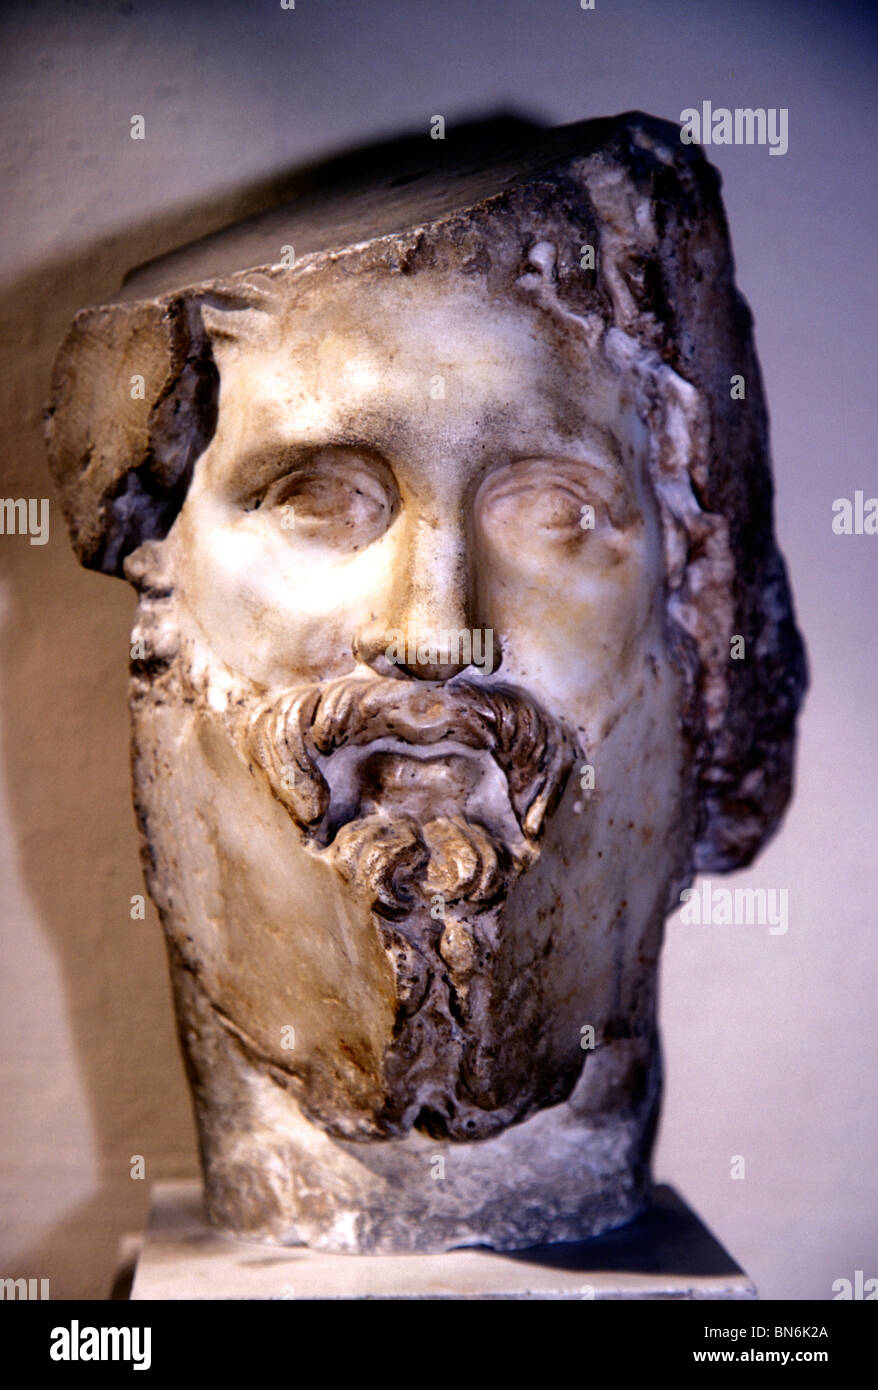 Griechischer Gott Asklepios Medizin Asklepios Kopf Stockbild